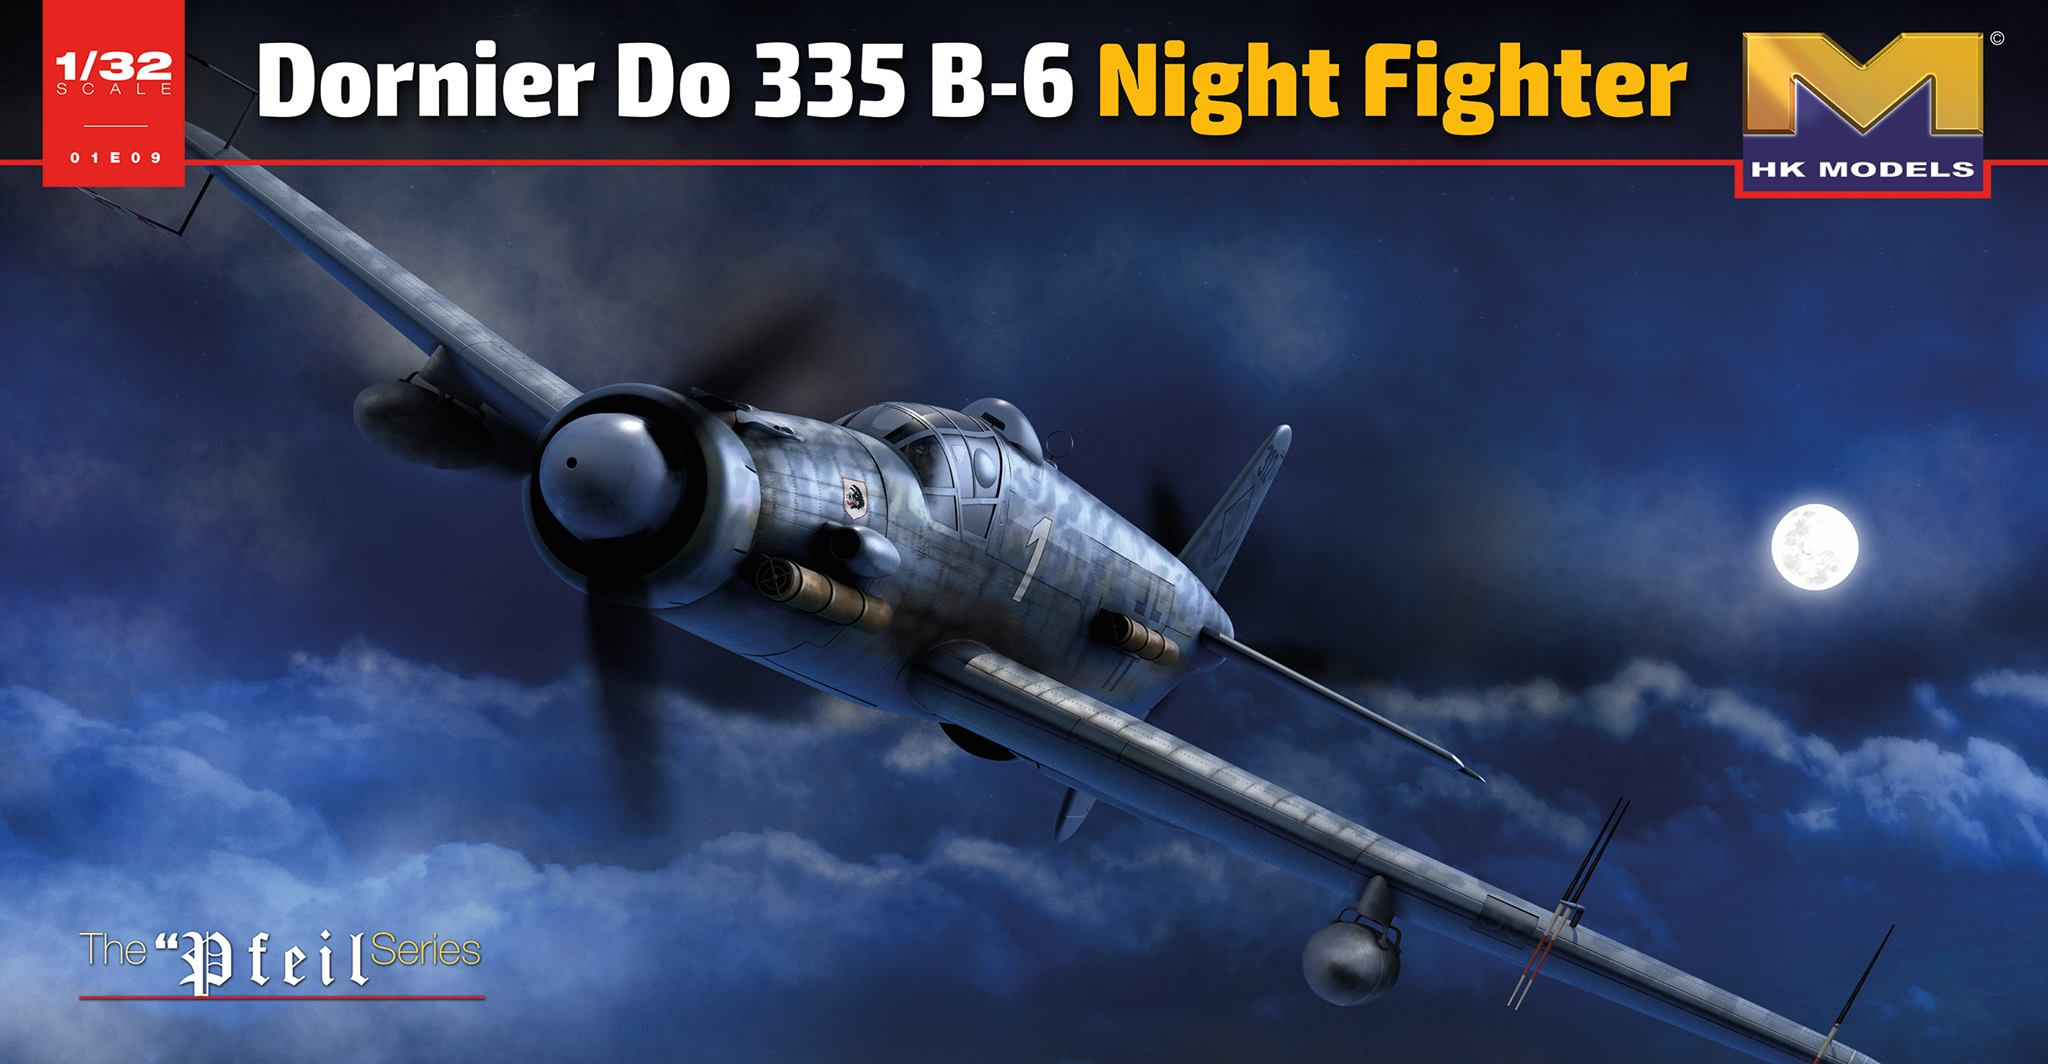 HK Models 1/32 WWII Leftwaffe Dornier DO335 B-2 Nightfighter, Aircraft